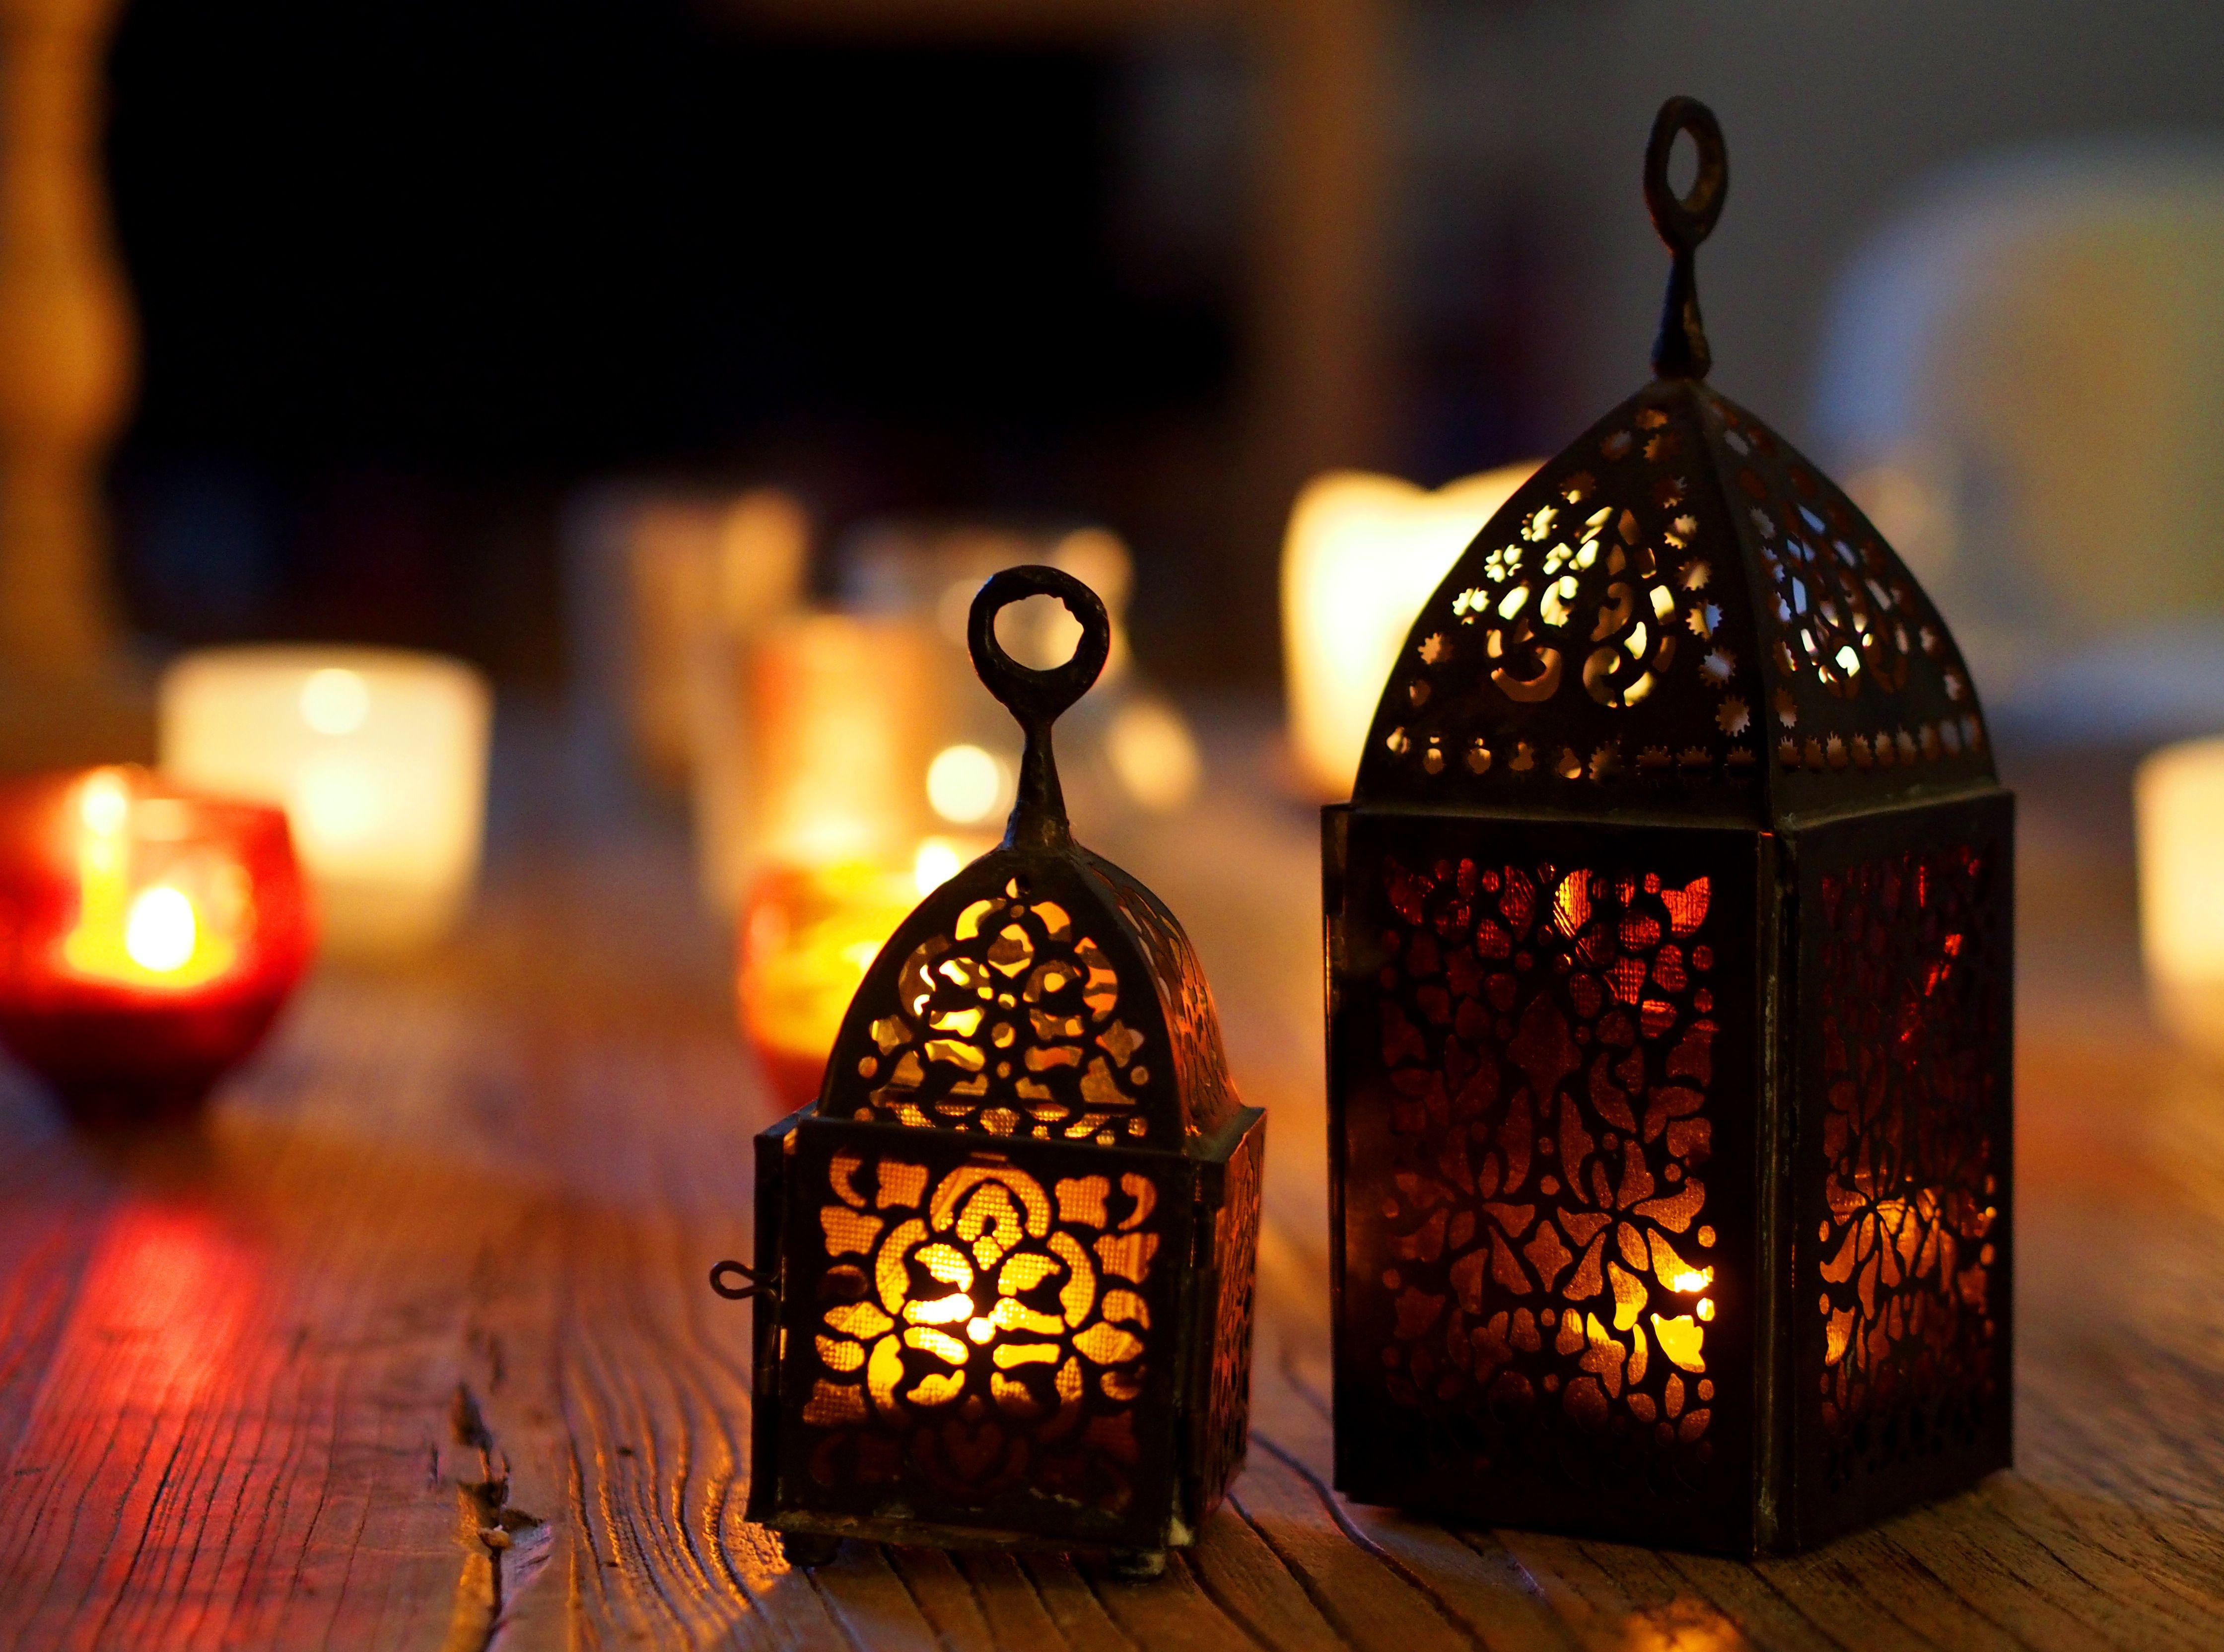 moroccan lights | Morocco and Lights for Moroccan Lamp Photography  103wja